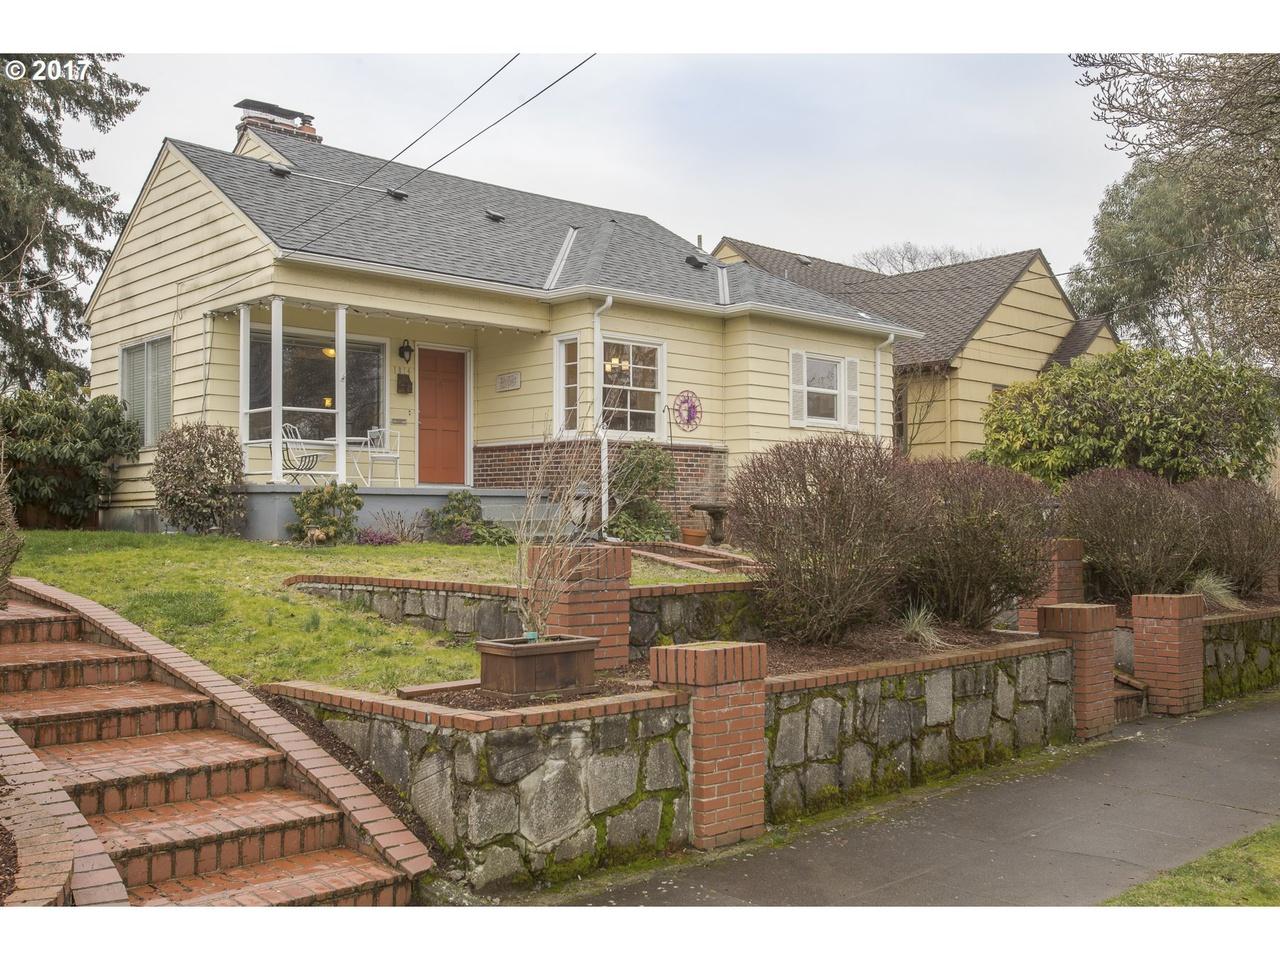 1814 NE Ainsworth St, Portland, OR 97211 | MLS# 17295321 | Redfin